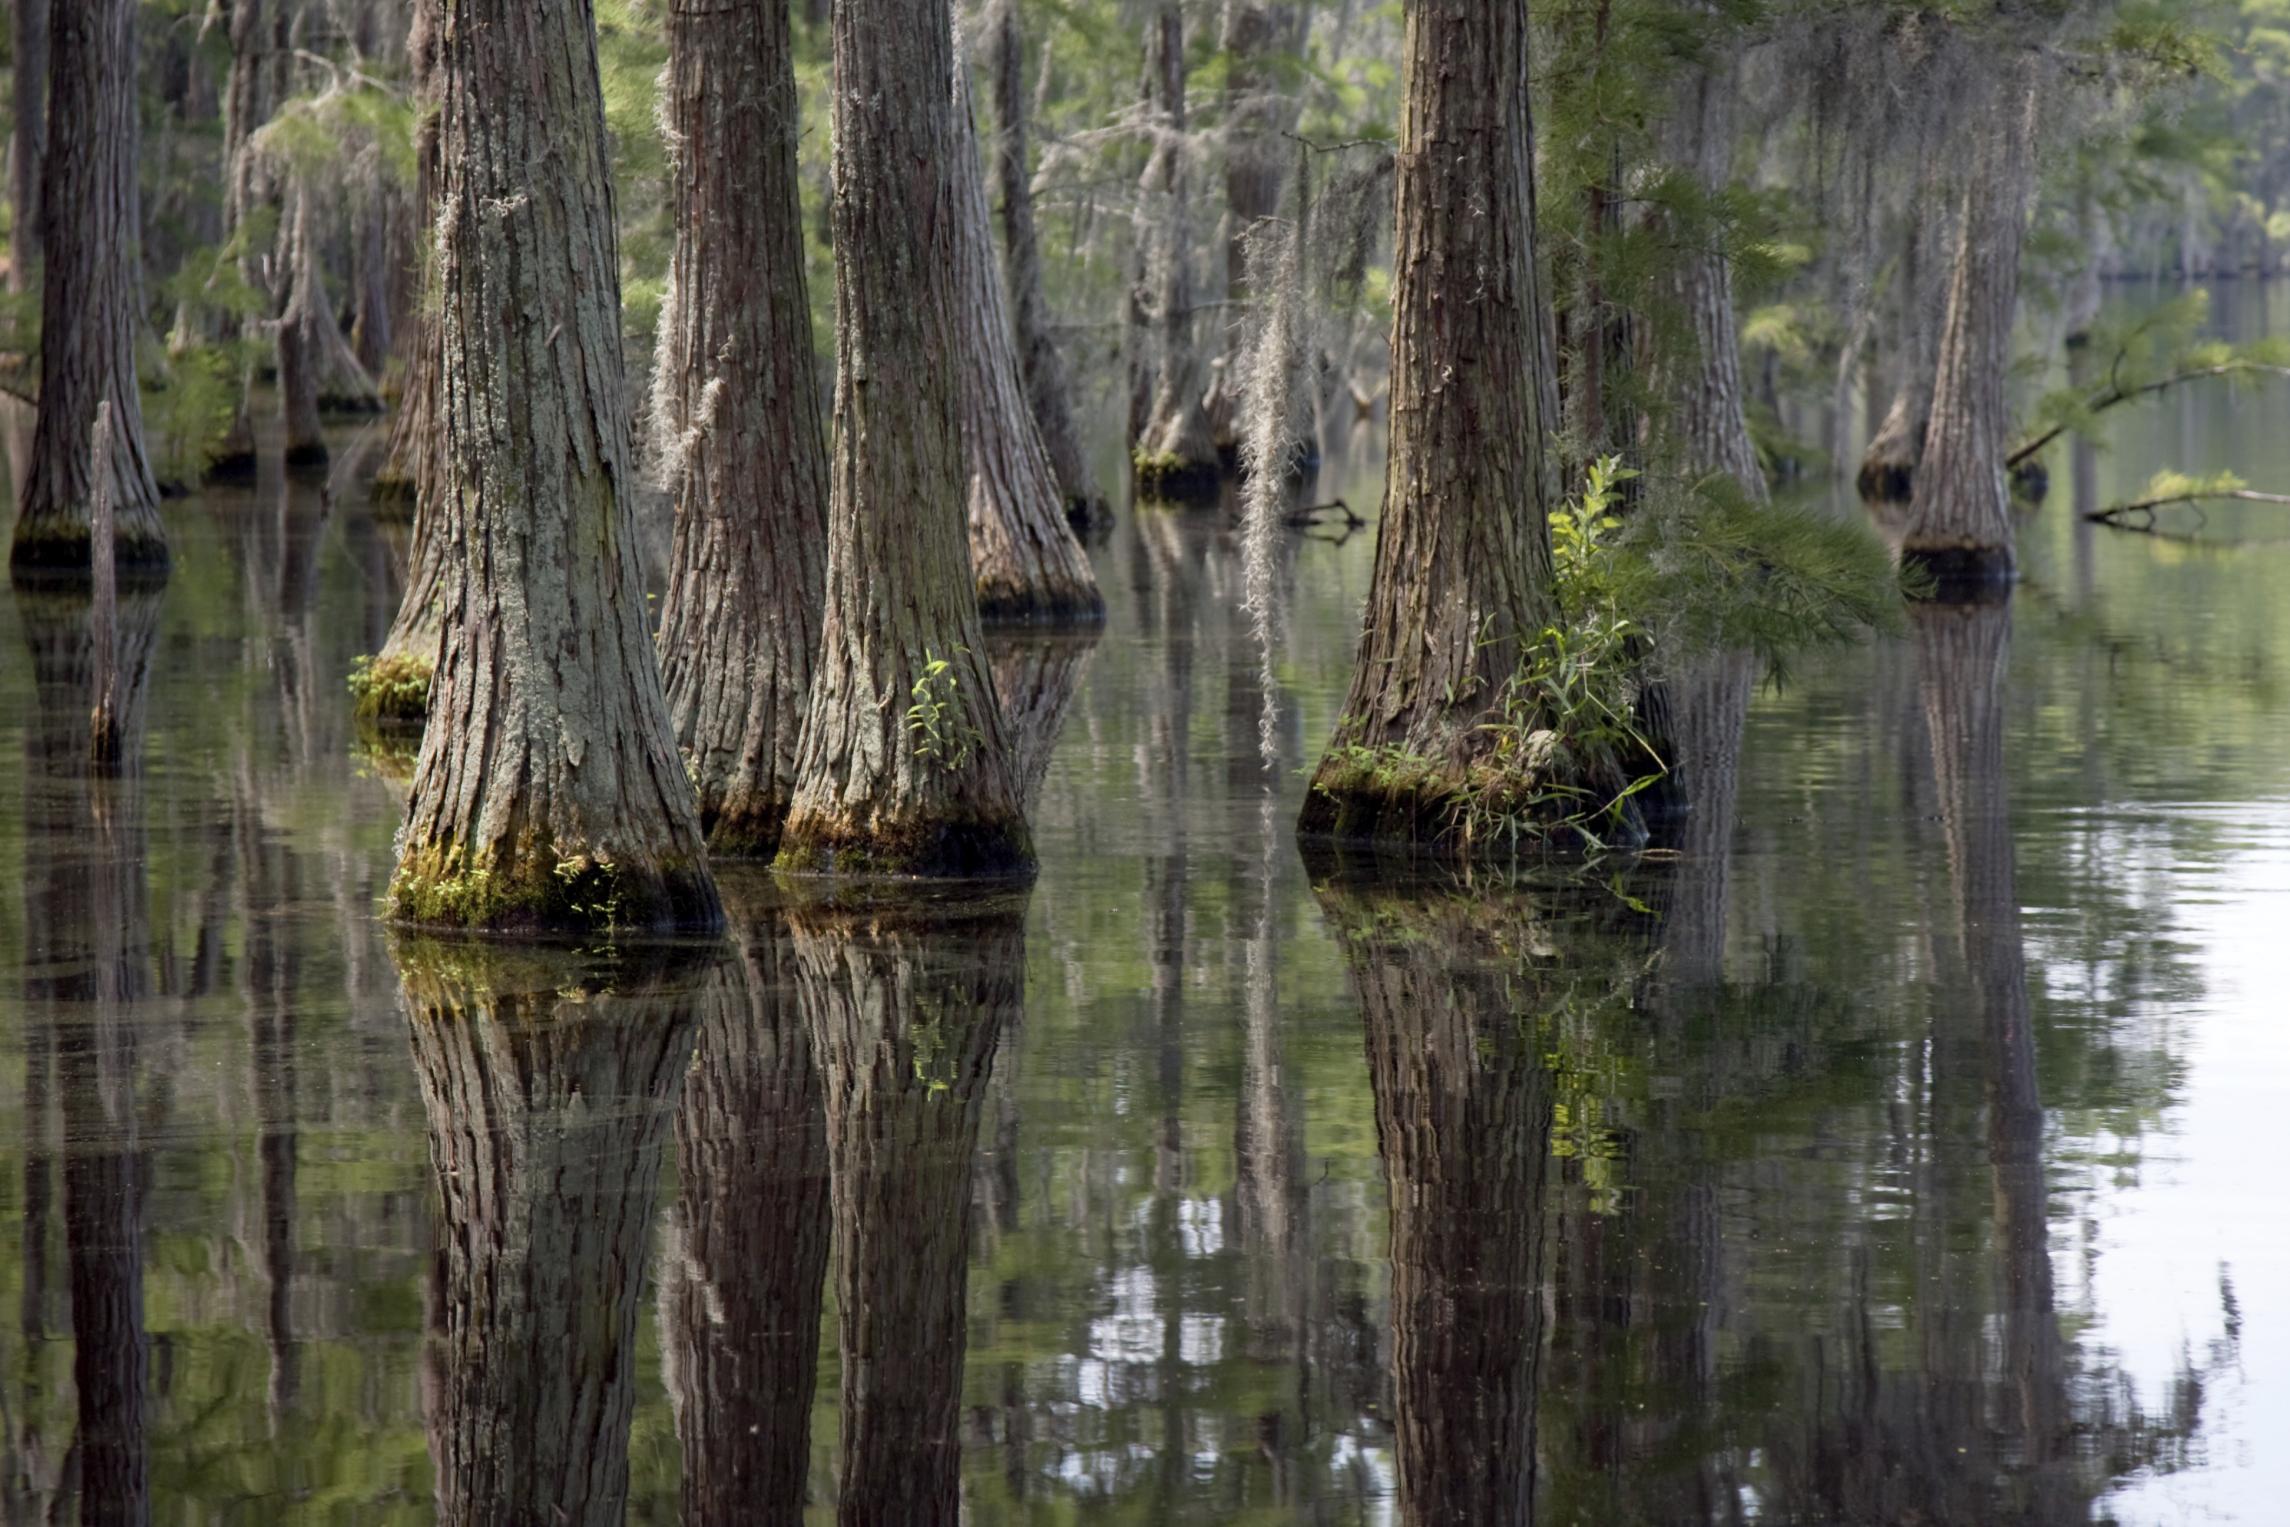 Swamp trees in Georgia